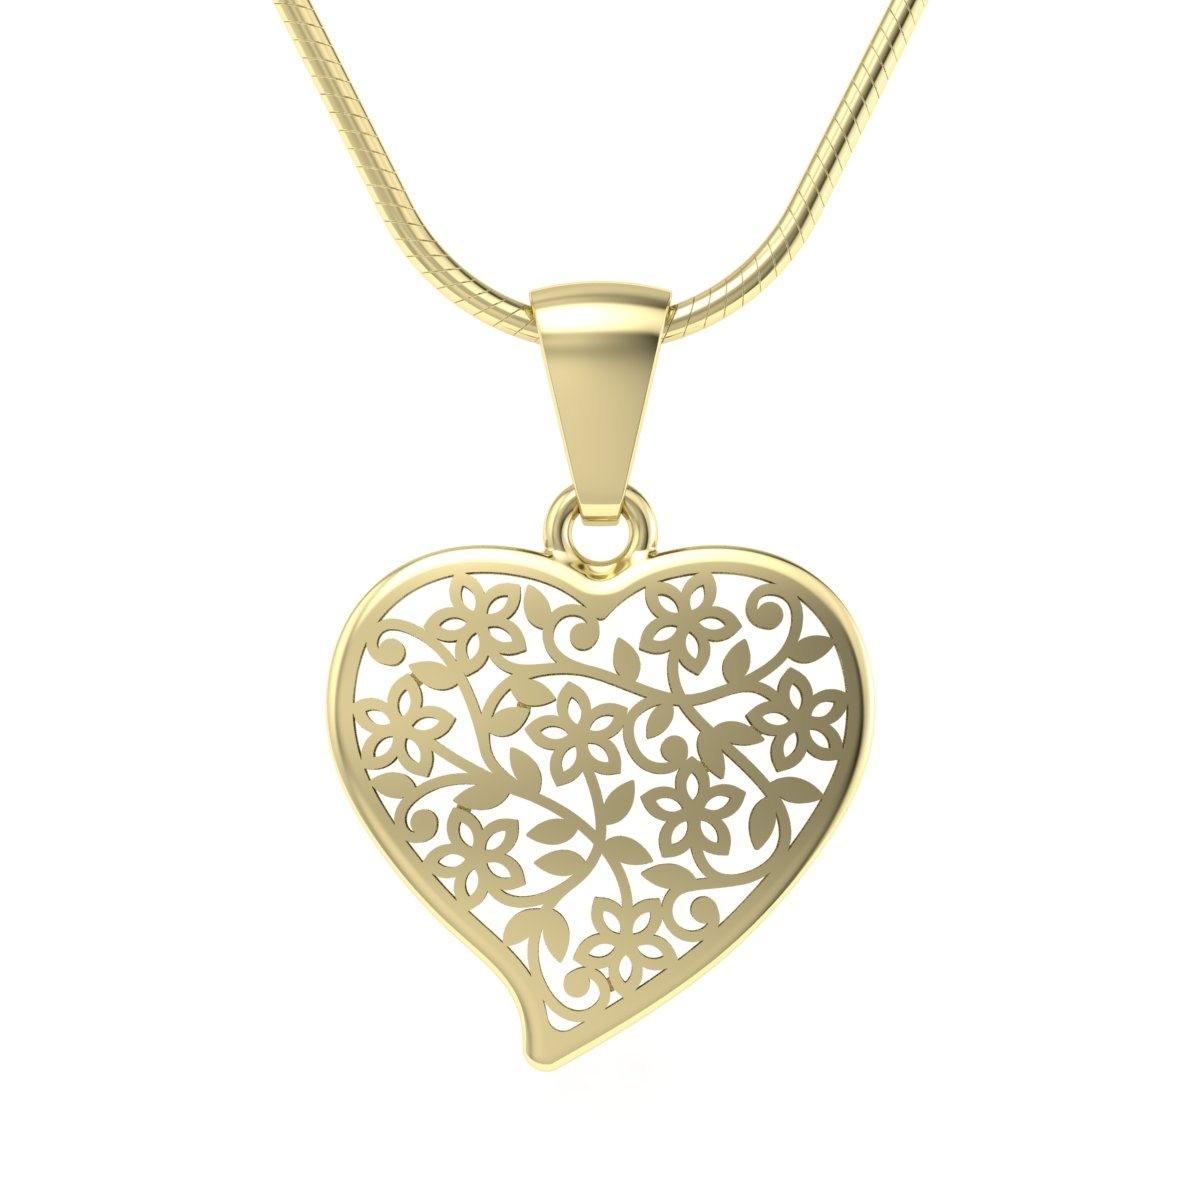 Złoty wisiorek serce